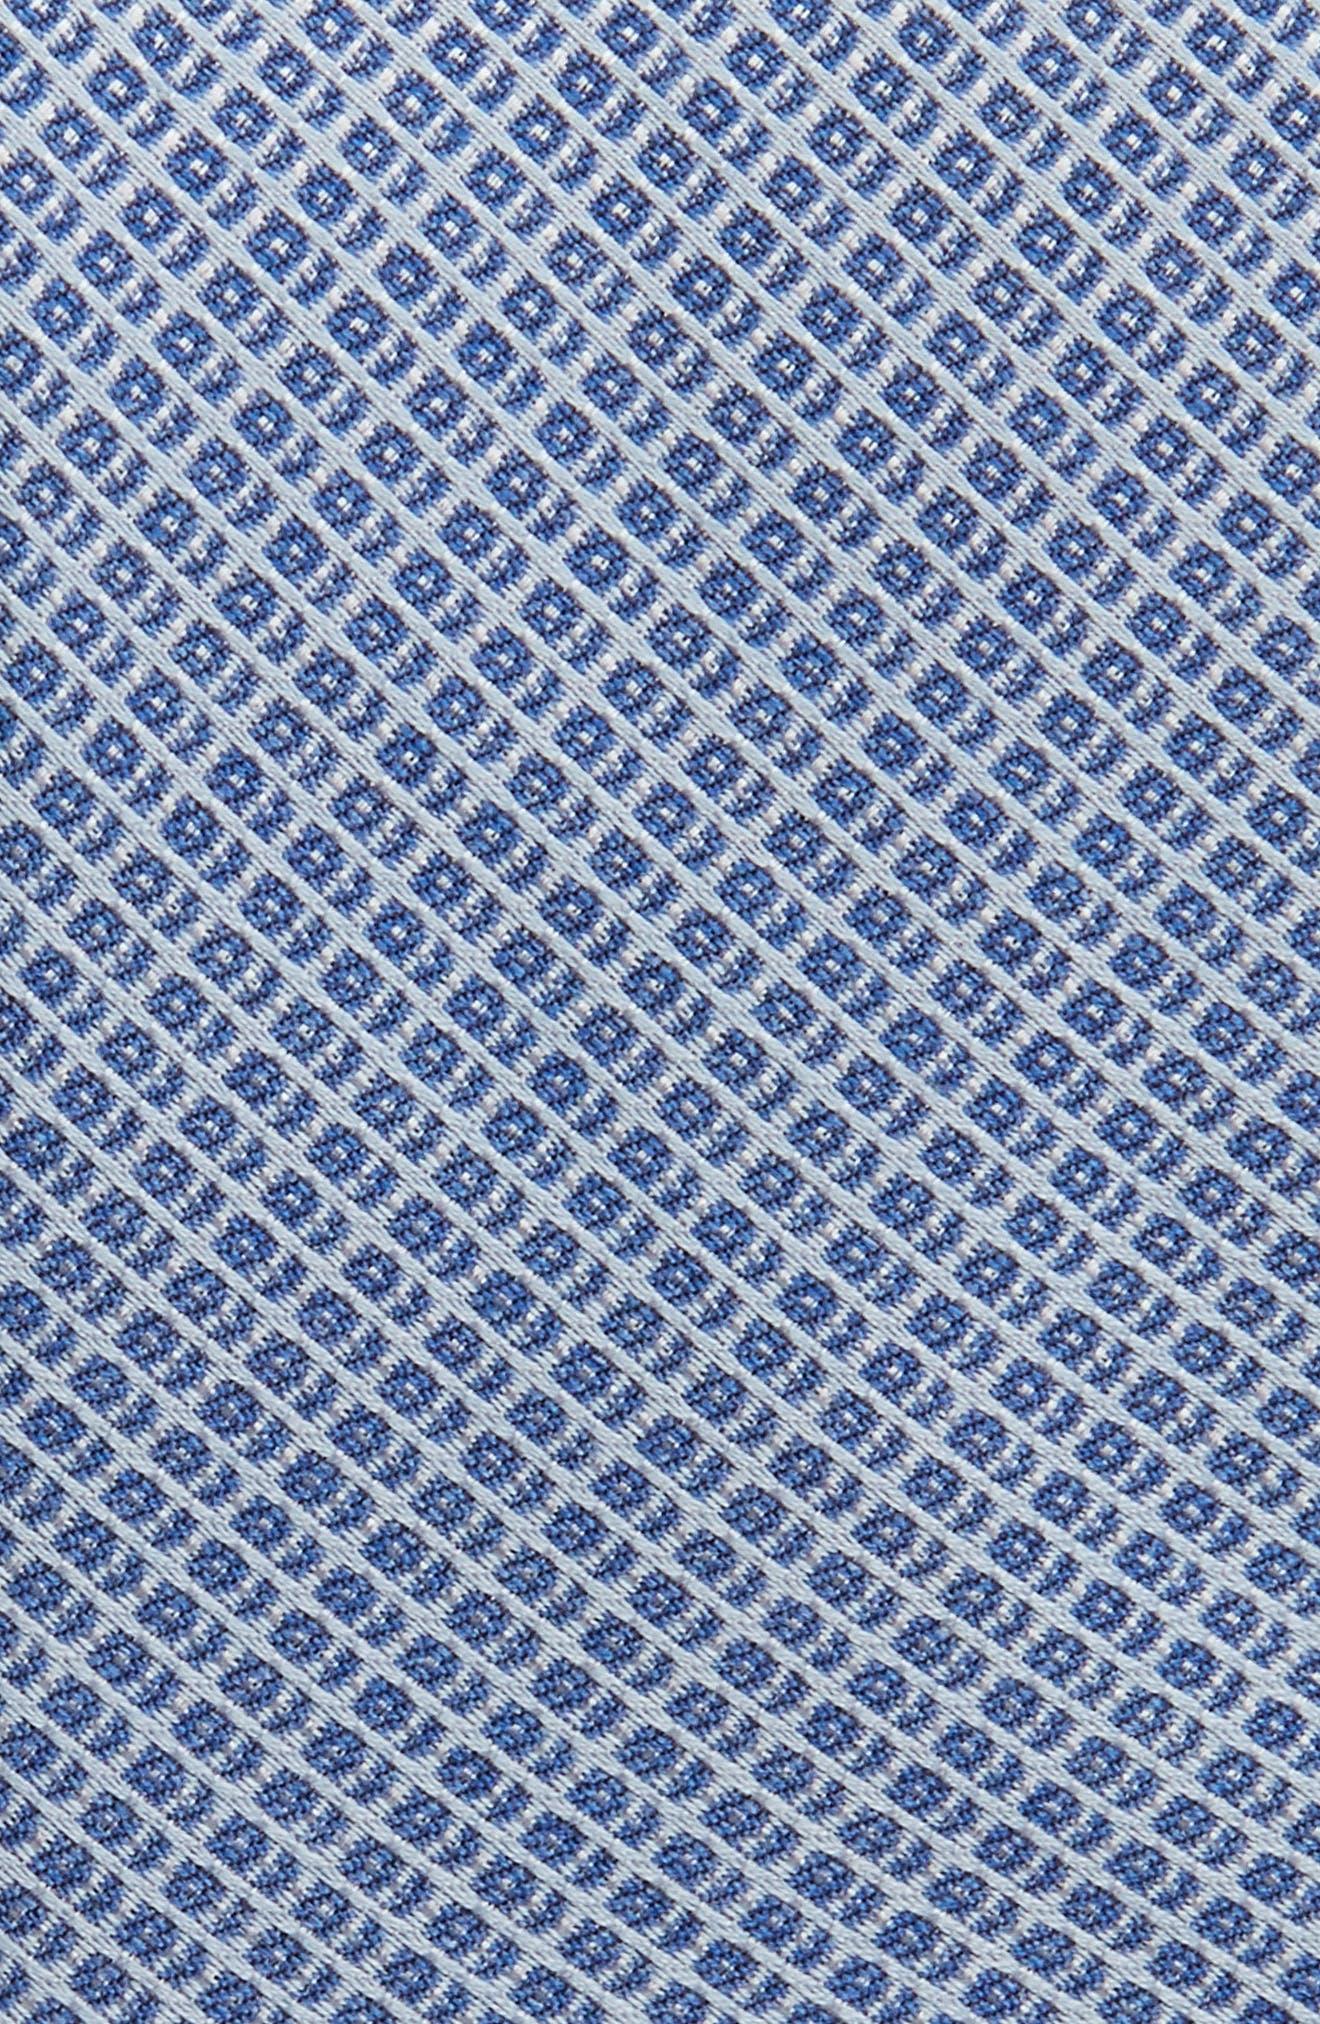 Geometric Silk Blend Tie,                             Alternate thumbnail 2, color,                             Blue